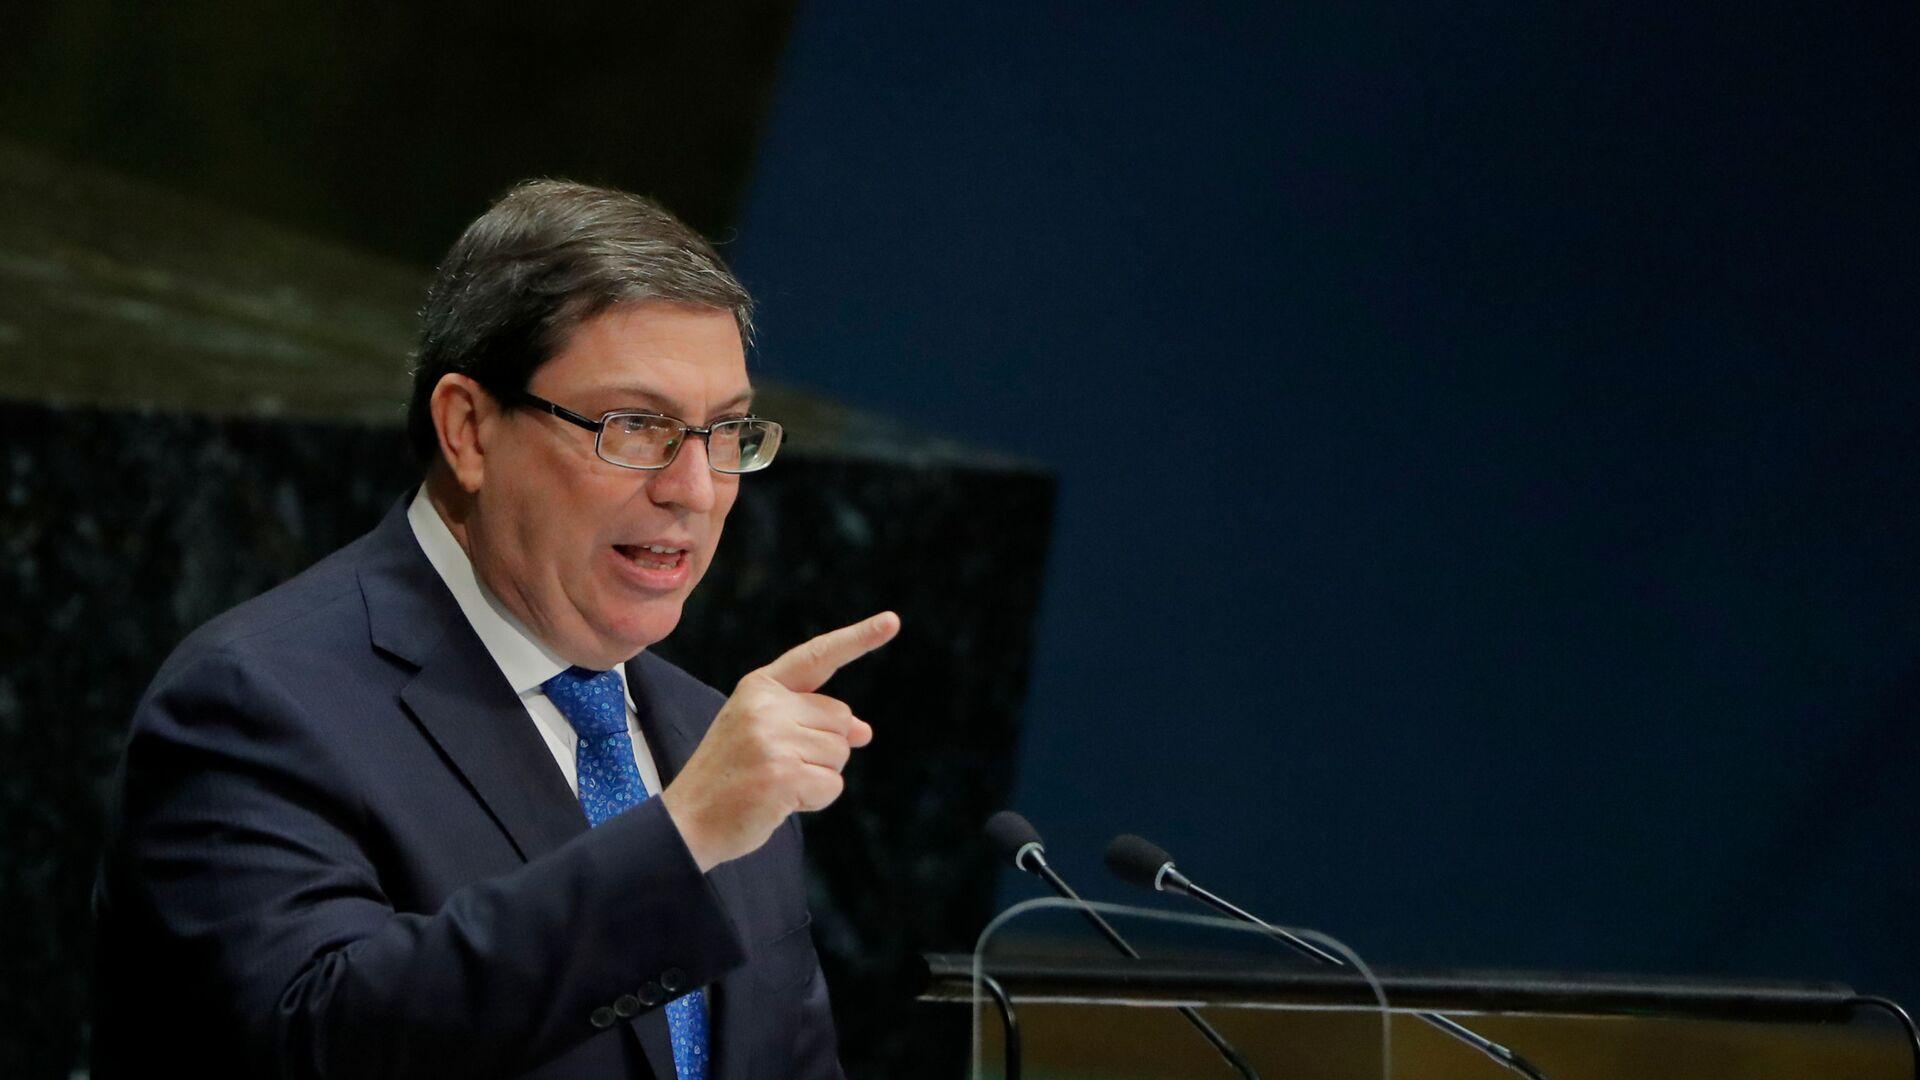 Bruno Rodríguez Parrilla, ministro de Exteriores de Cuba - Sputnik Mundo, 1920, 03.09.2021